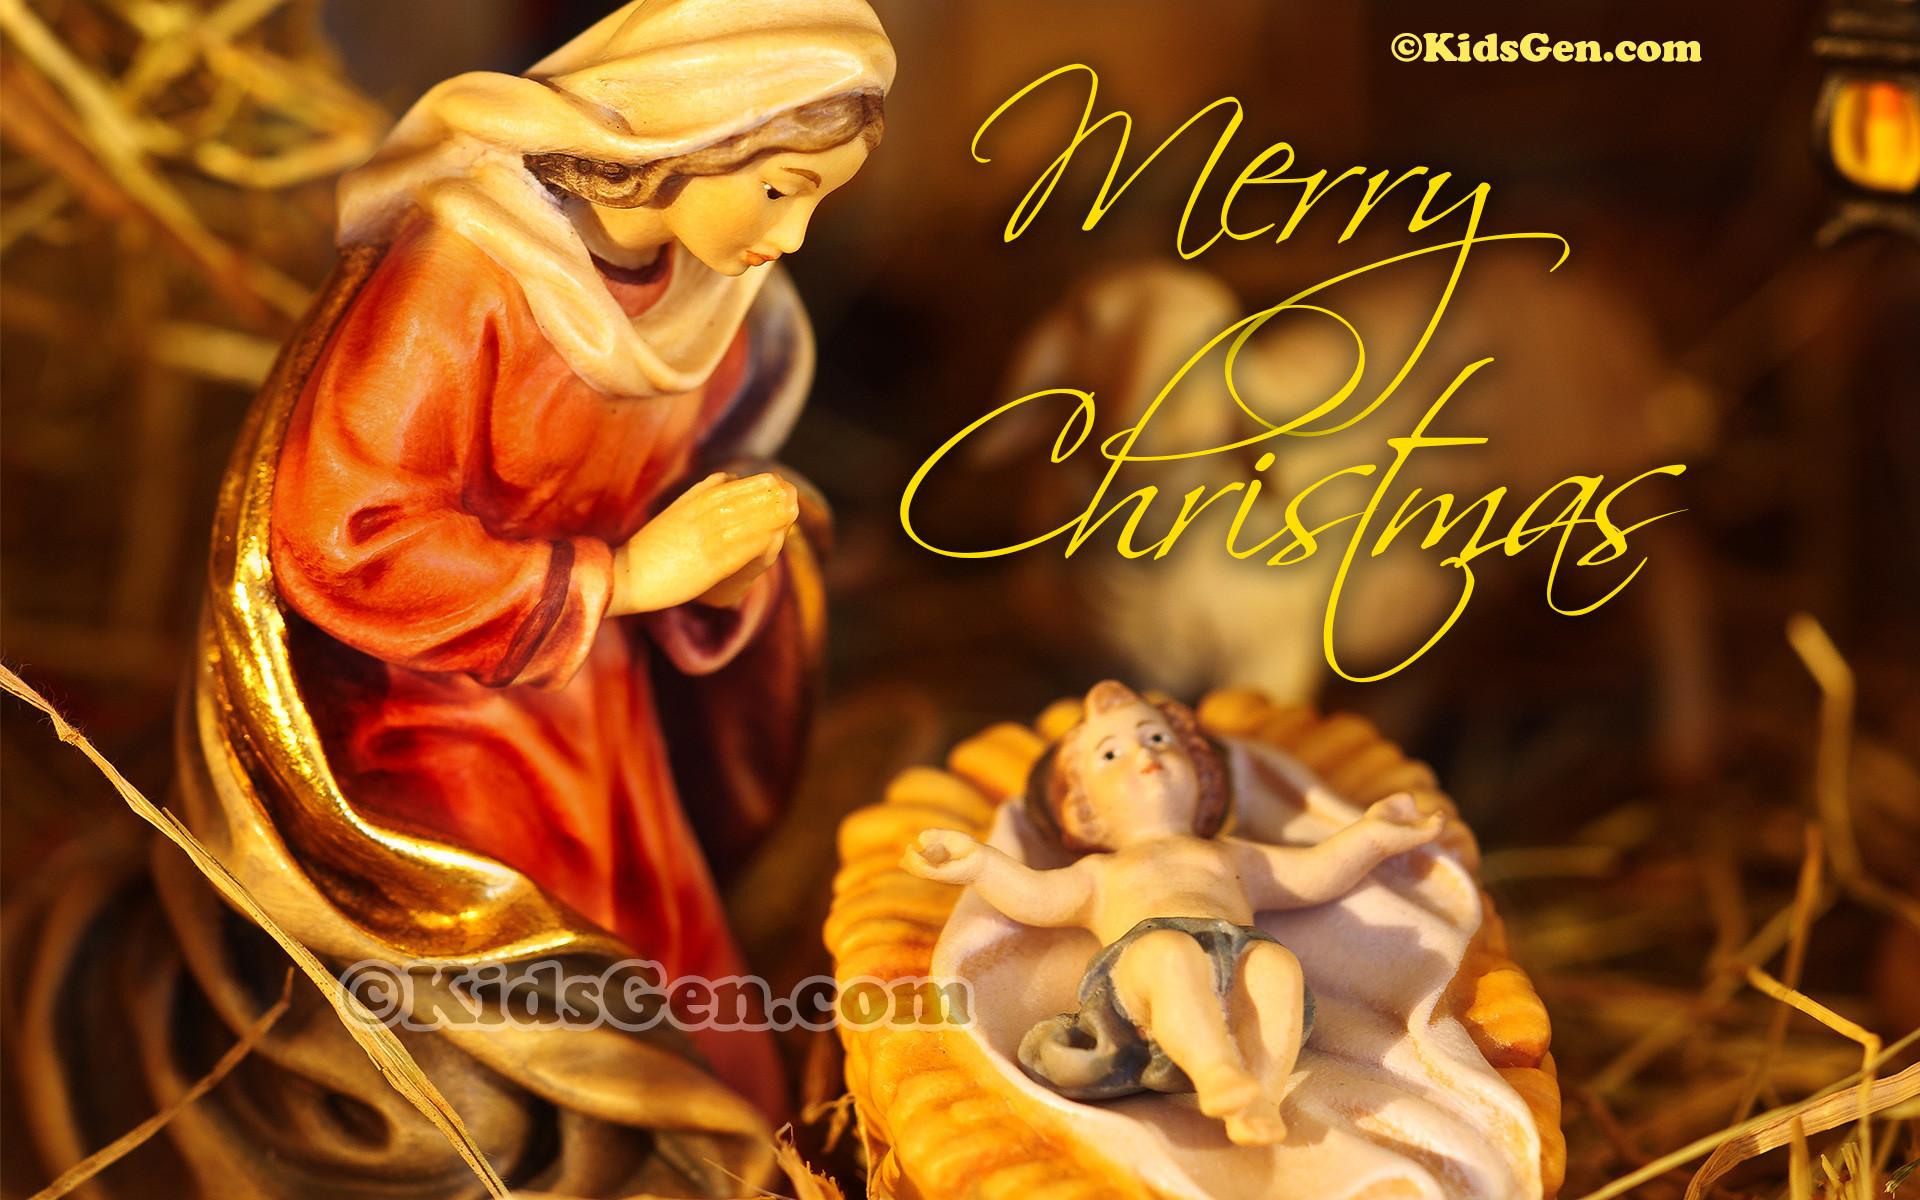 Christmas Jesus Wallpaper.Santa And Baby Jesus Wallpaper 59 Images